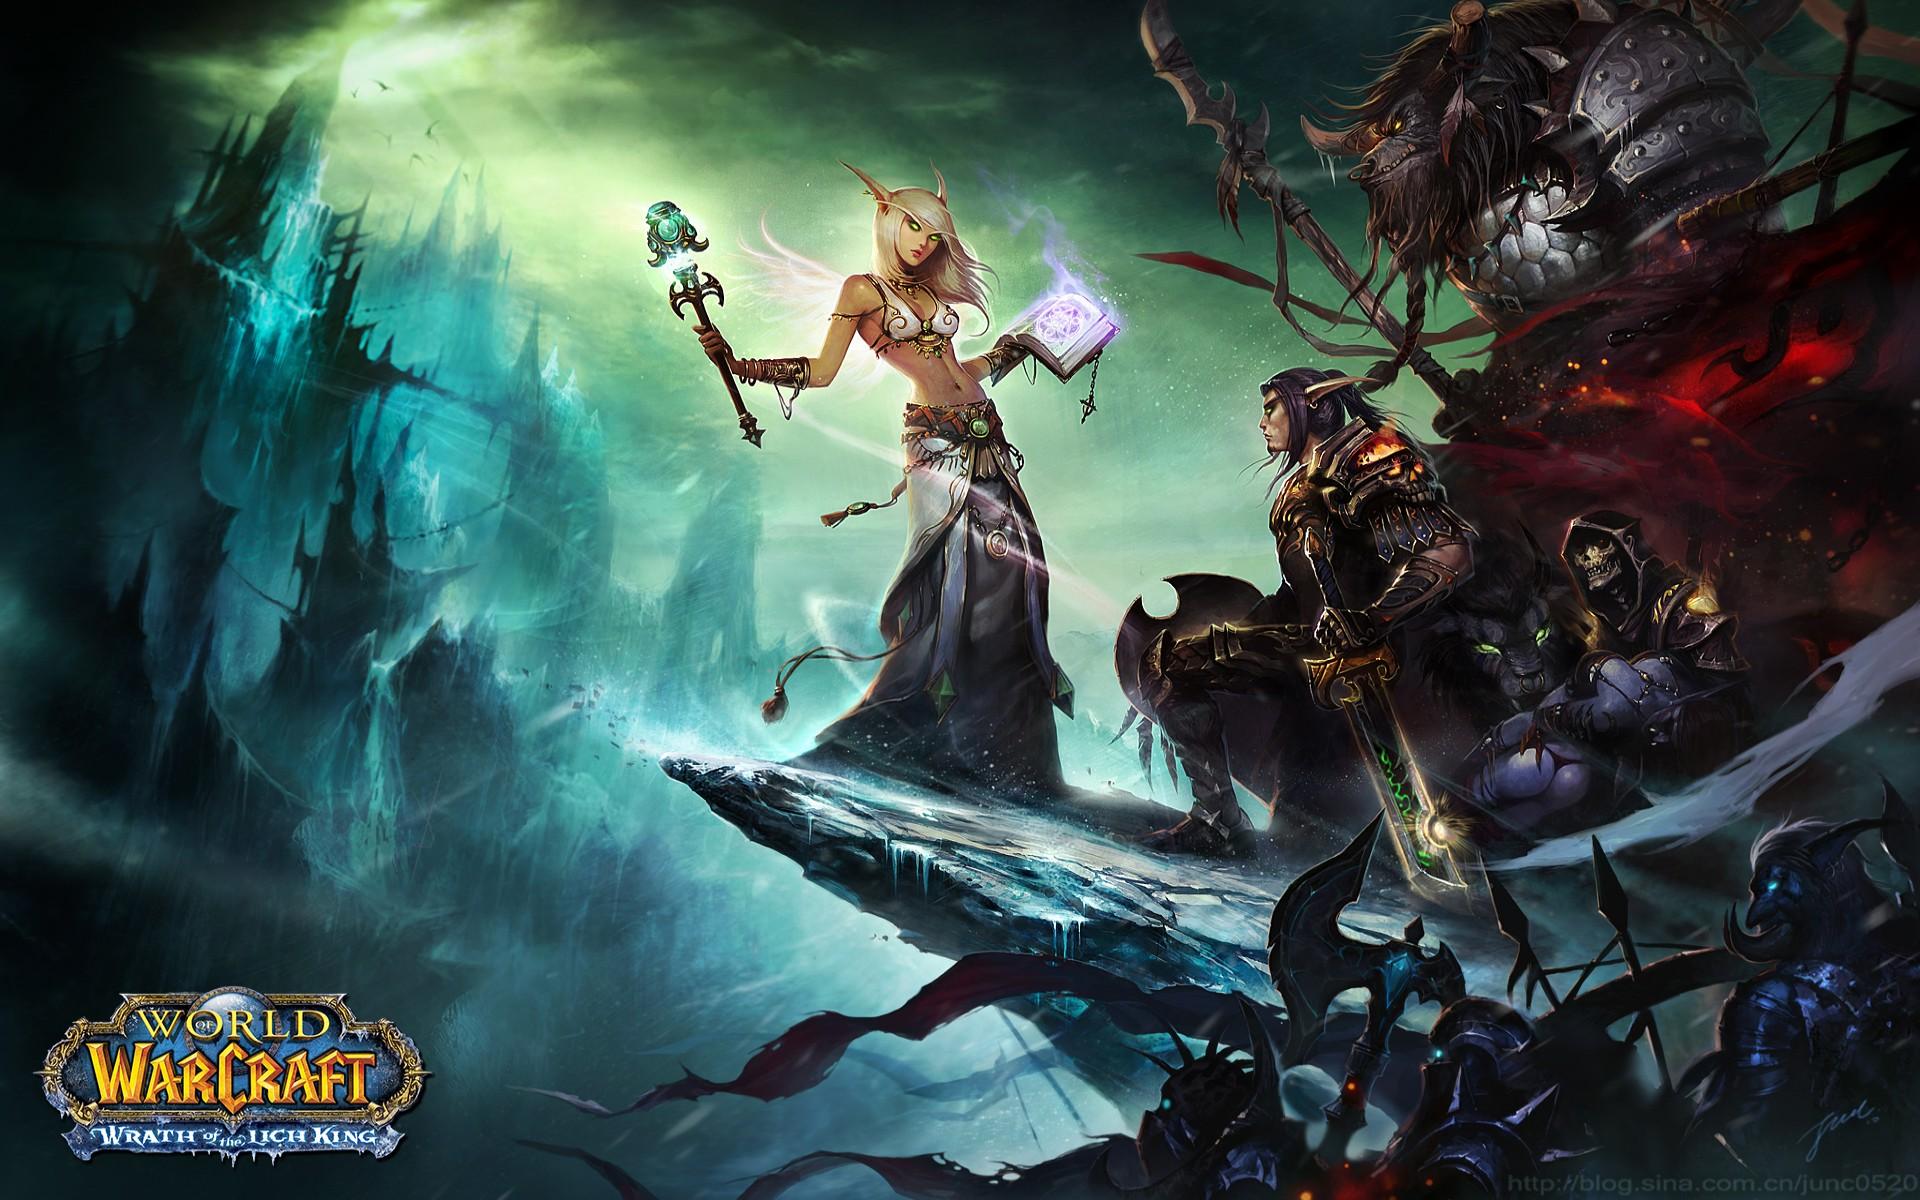 World of Warcraft HD Wallpapers   Album on Imgur 1920x1200